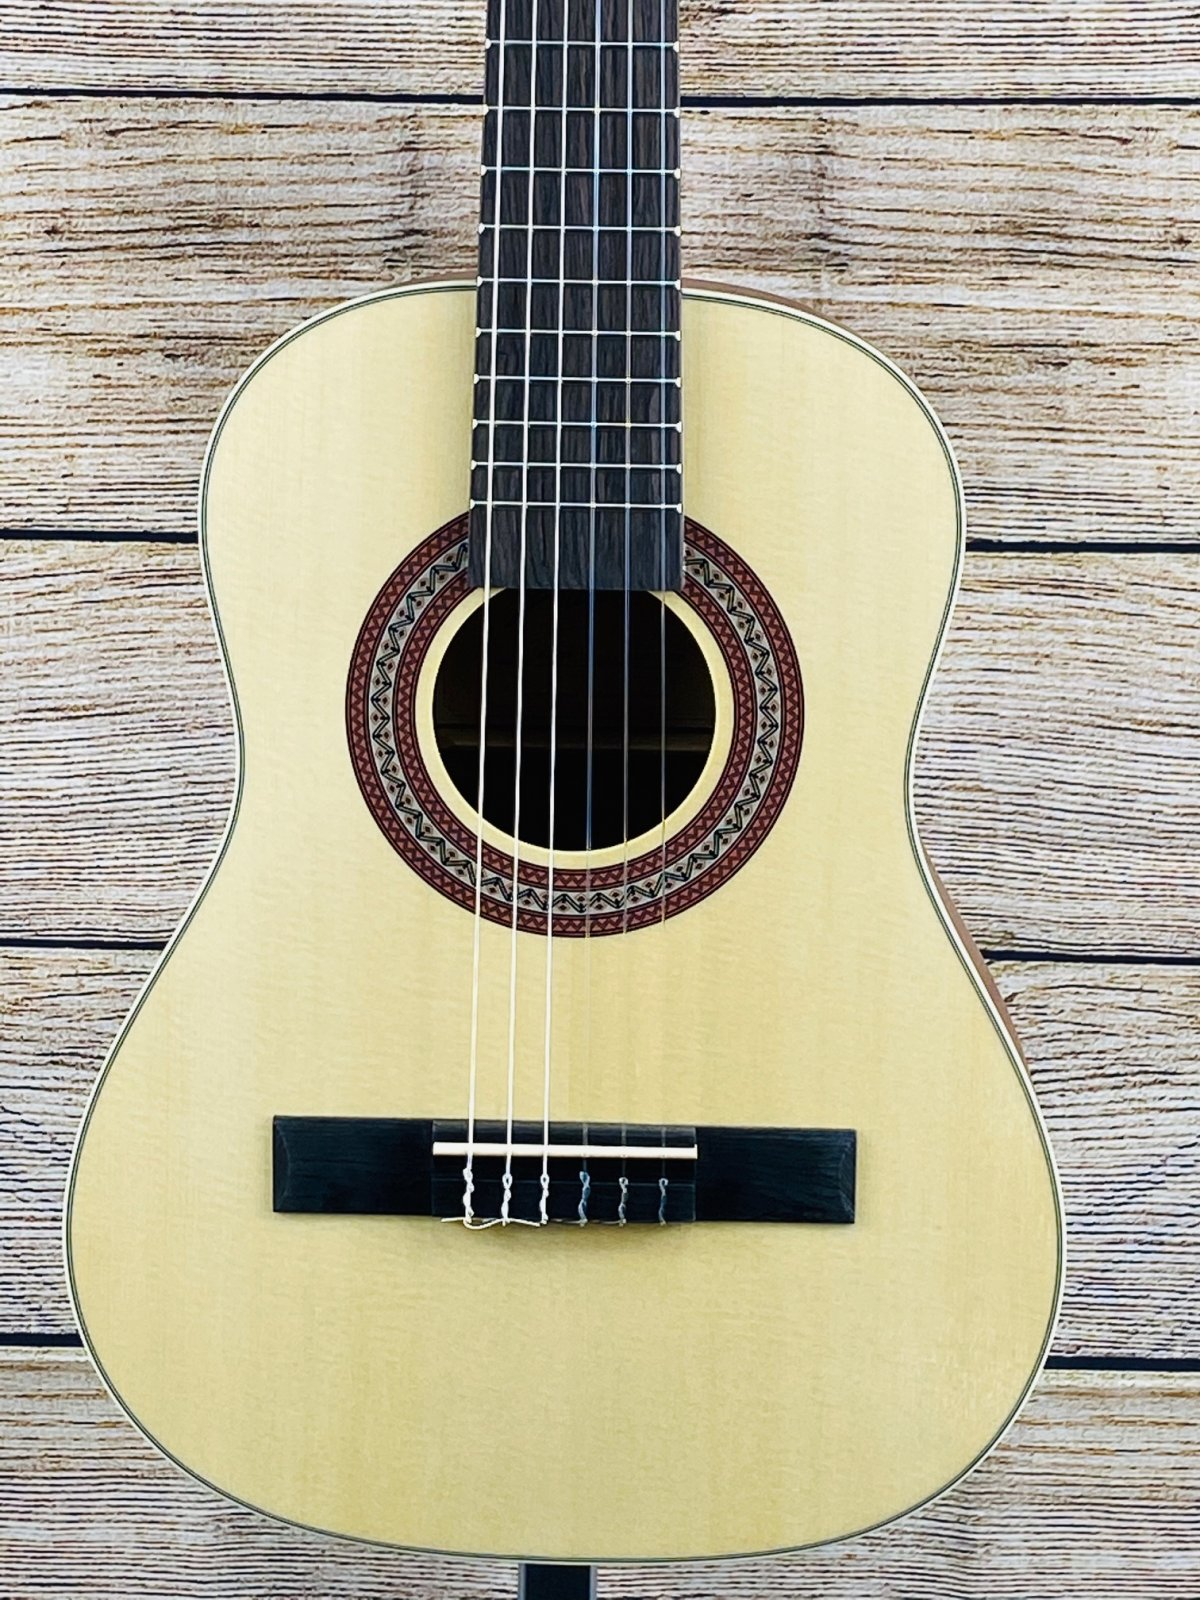 Austin AC312N 1/2 Size Classical Guitar